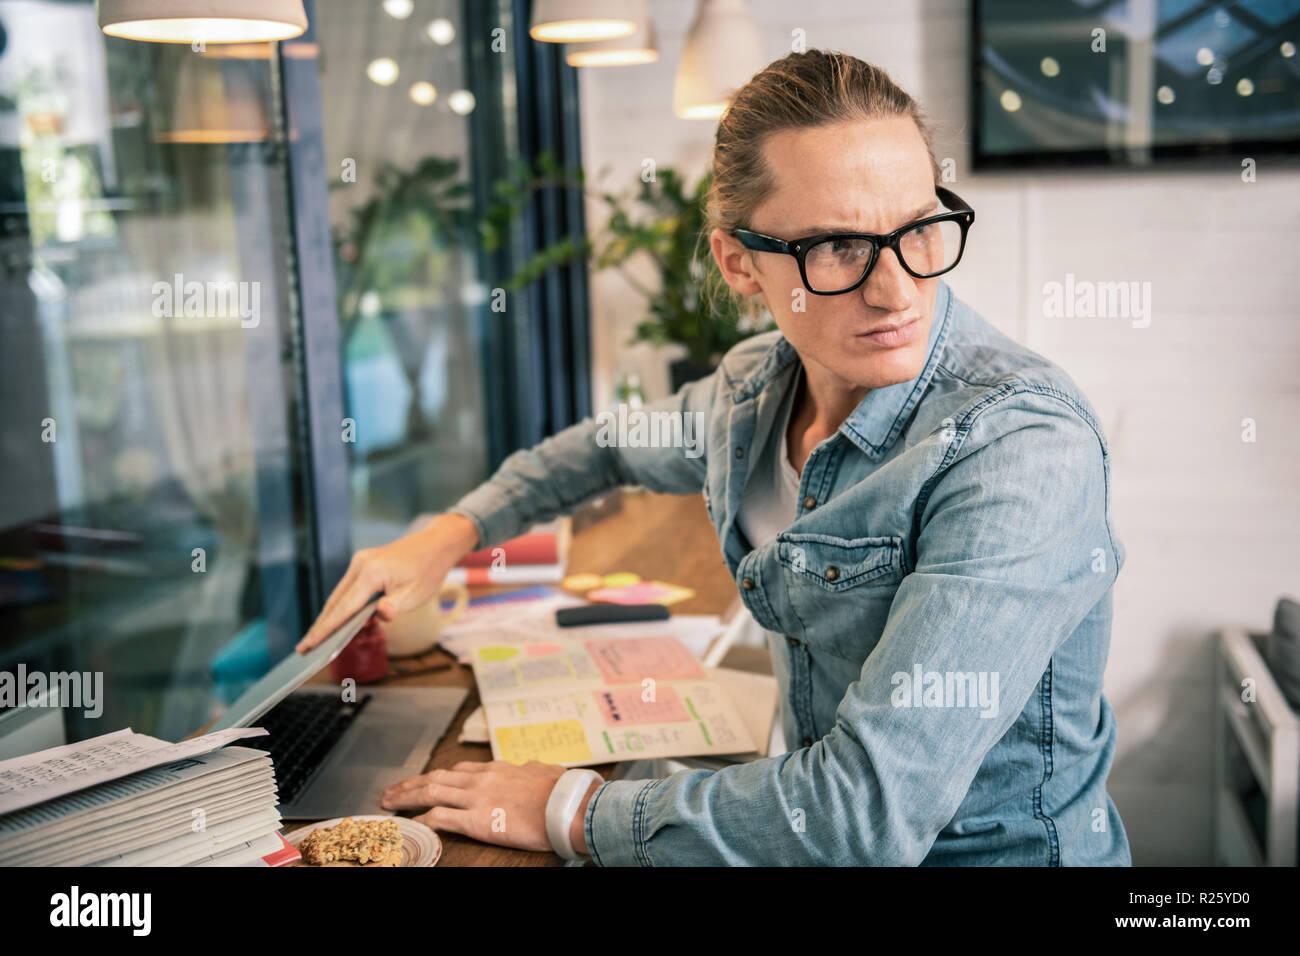 Unhappy cheerless young man closing his laptop - Stock Image